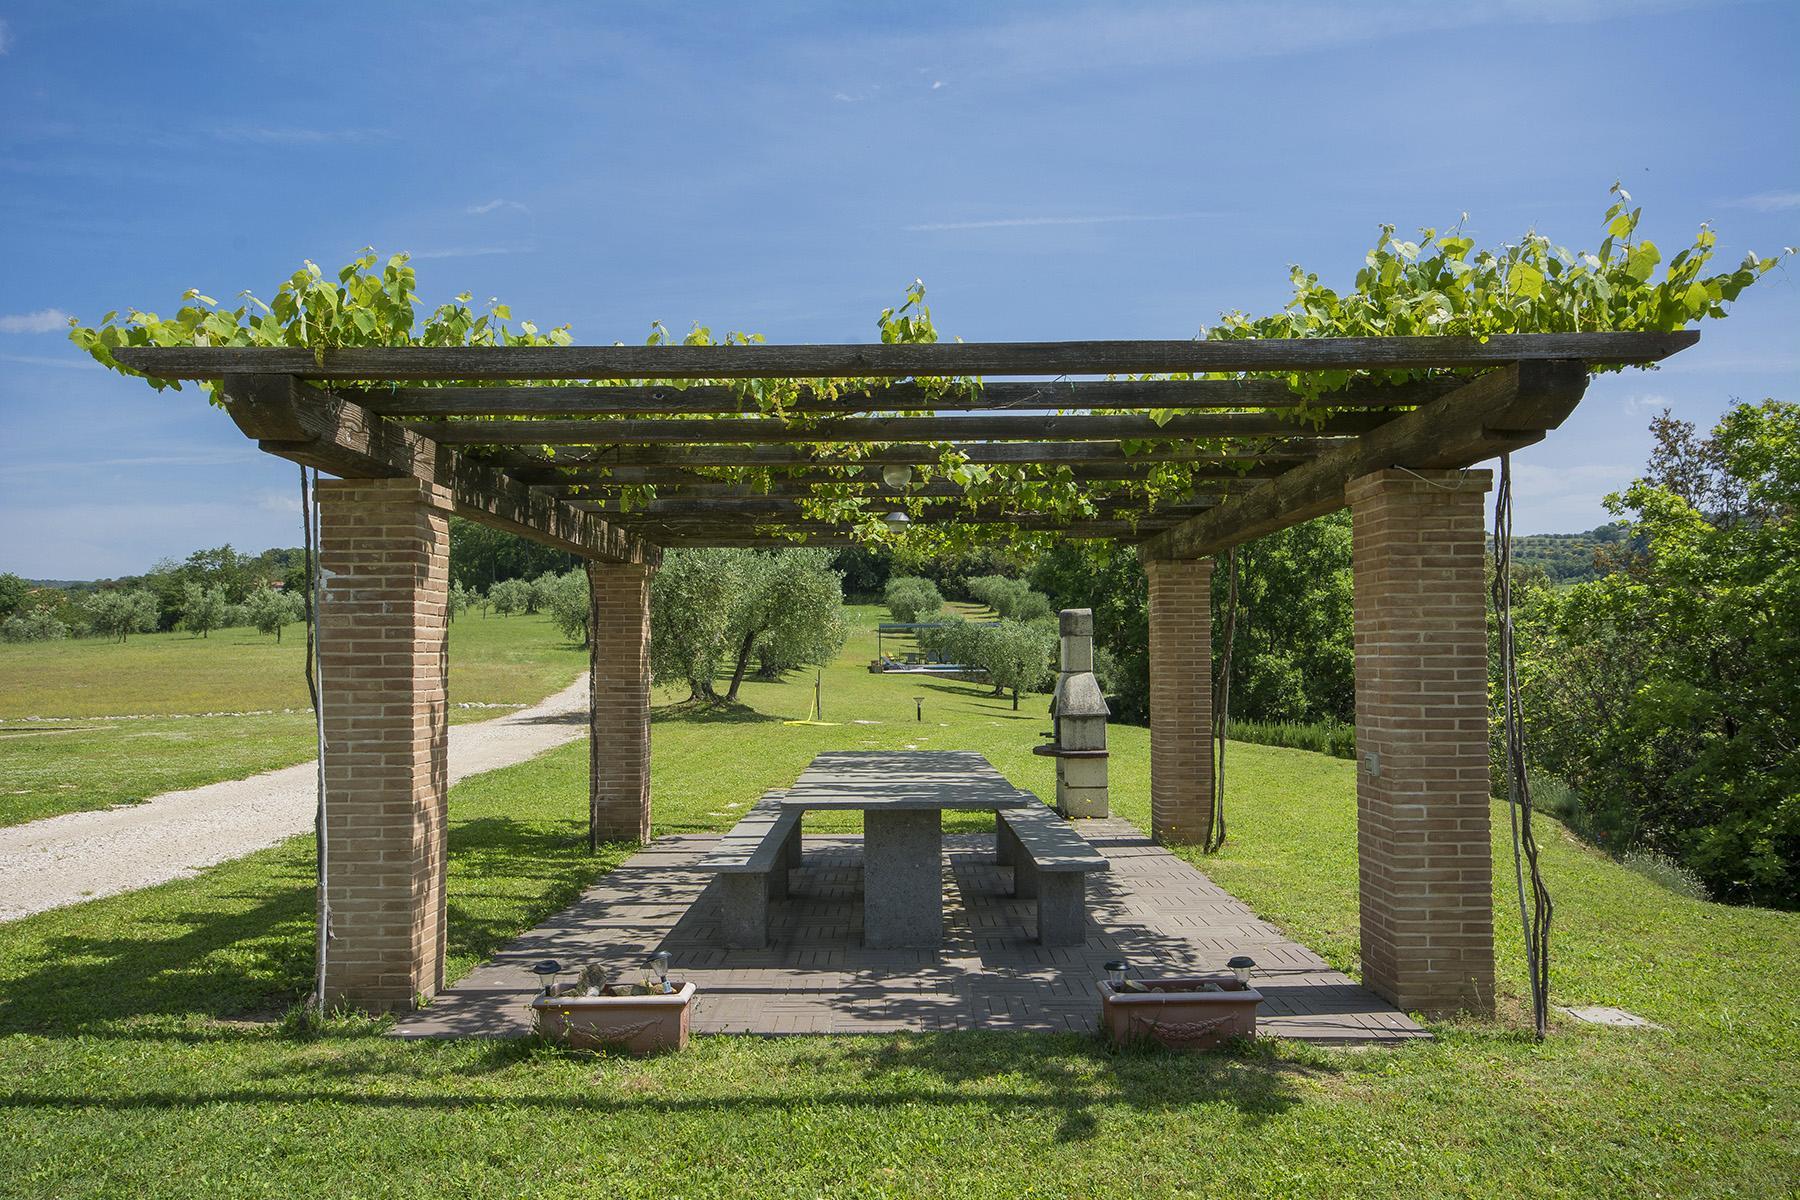 Eccezionale proprietà tra Toscana e Umbria - 8